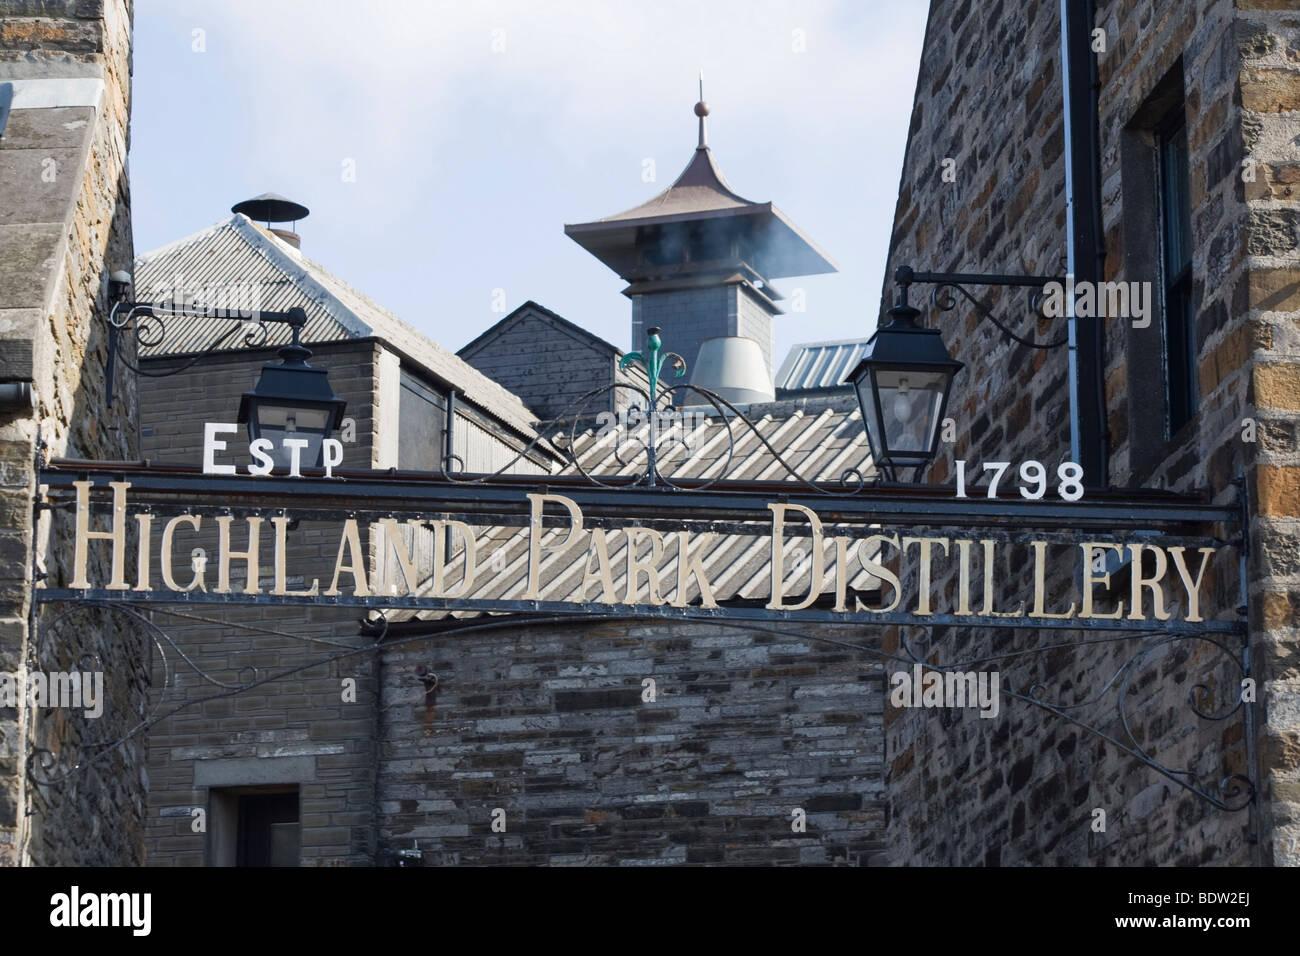 Eingang, entrance, highland park distillery in kirkwall, orkney islands, scotland - Stock Image